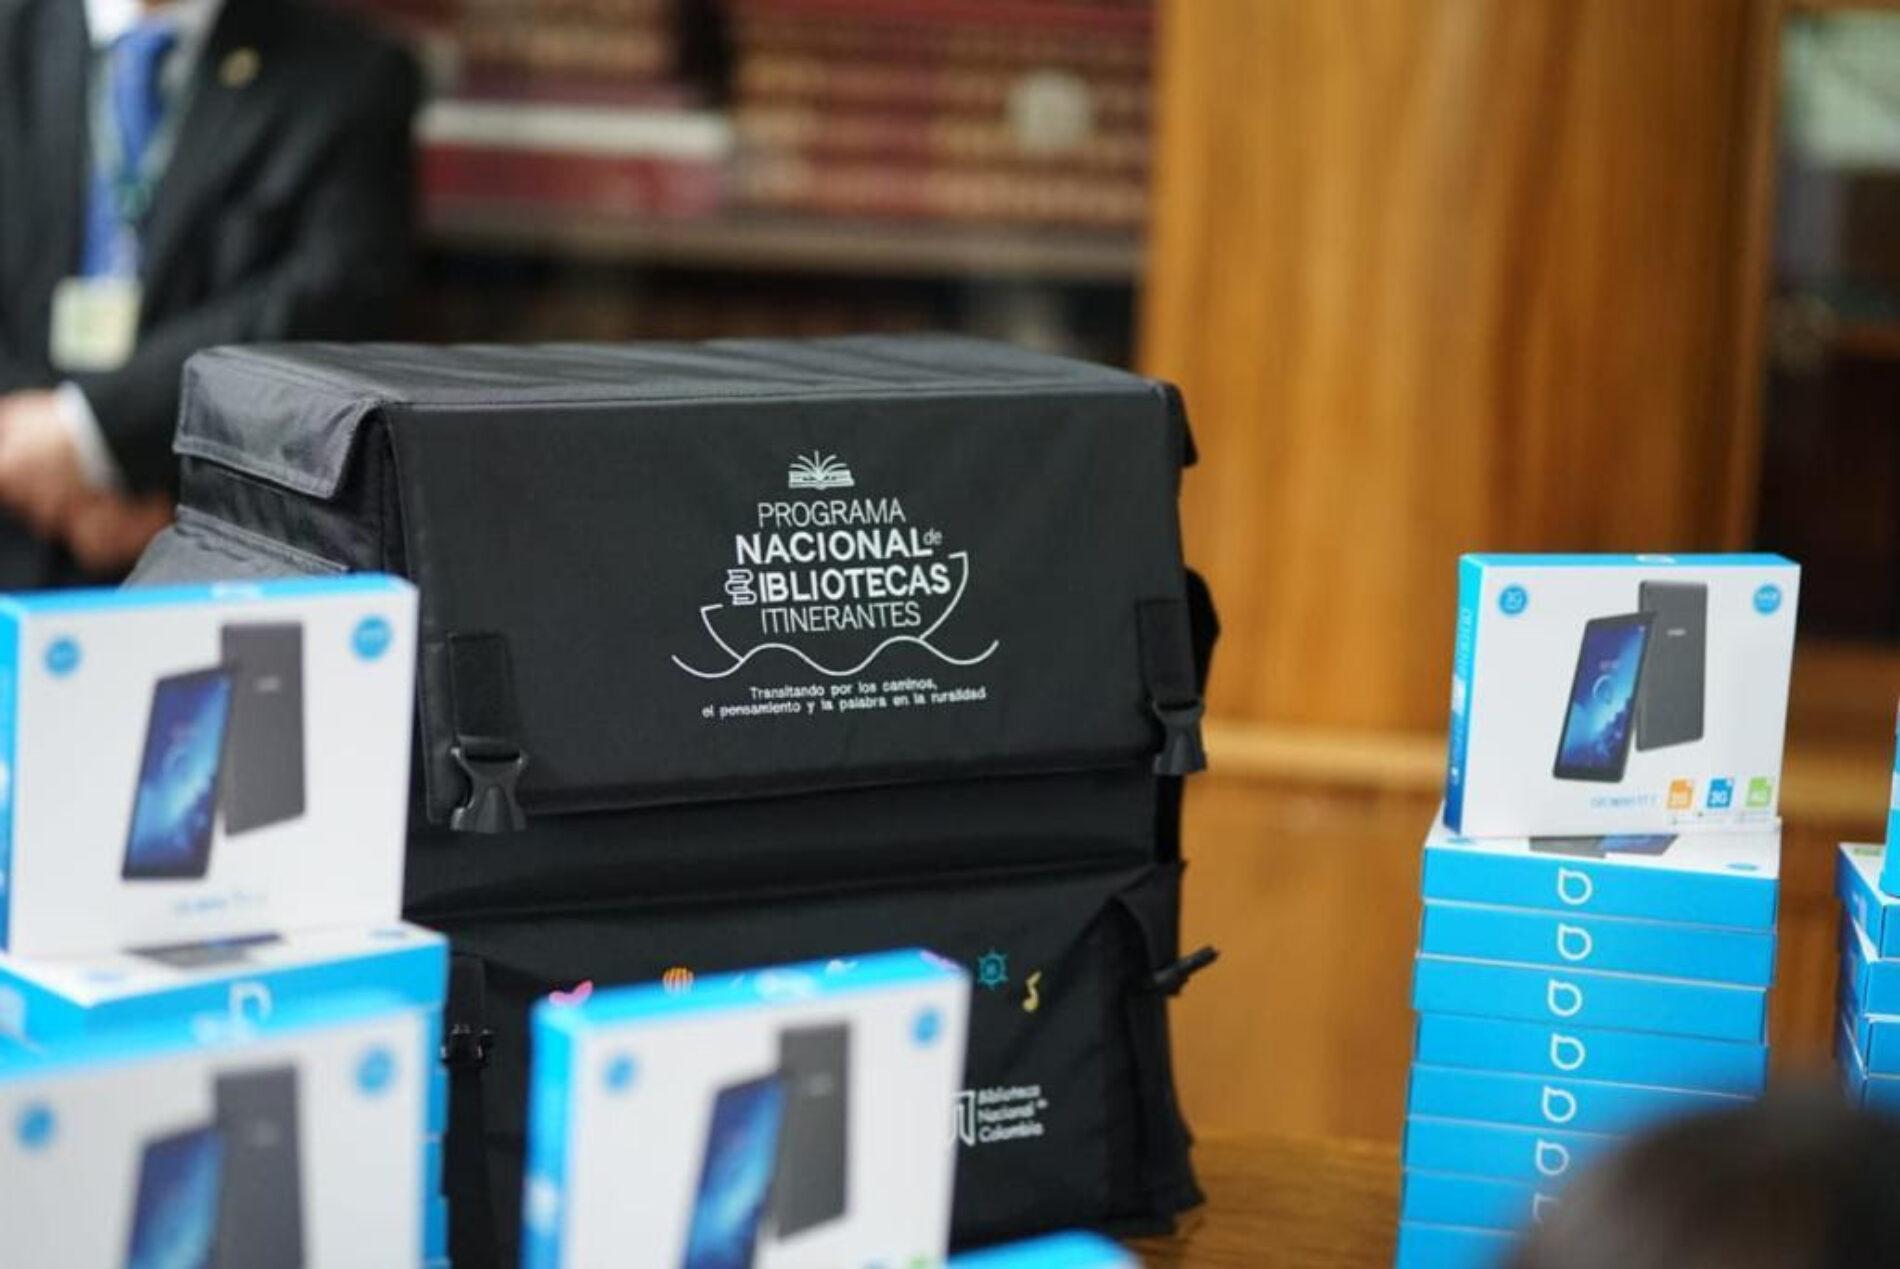 Gobierno de Emiratos Árabes Unidos donó 150 tabletas para Programa Nacional de Bibliotecas Itinerantes